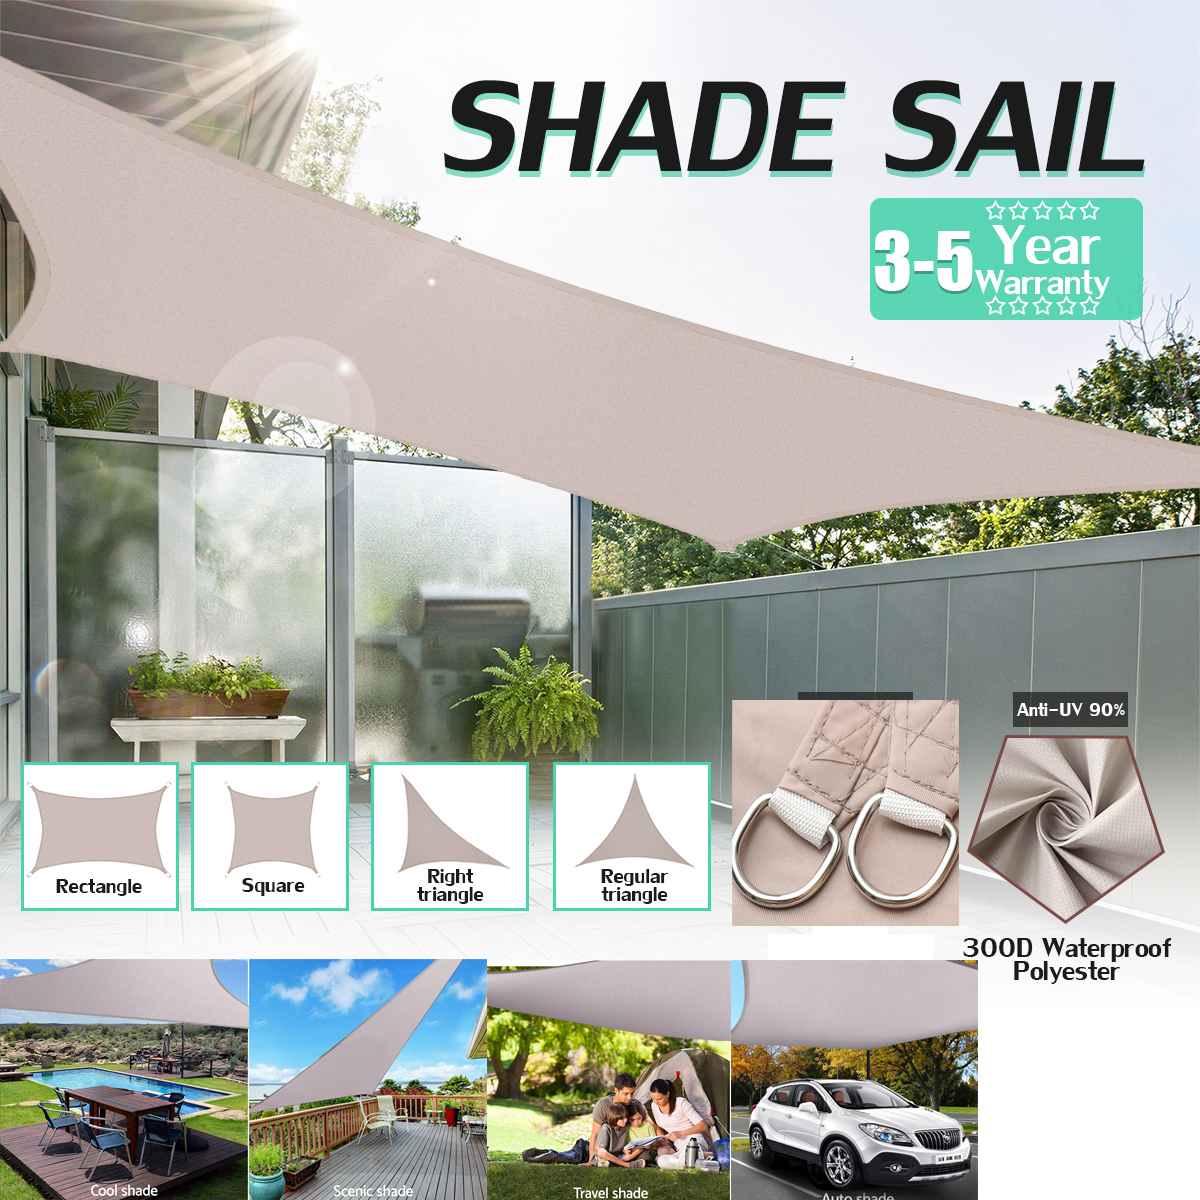 Waterproof Sun Shelter  Sunshade Protection Outdoor Canopy Garden Patio Pool Shade Sail Awning Camping Shade Cloth Large